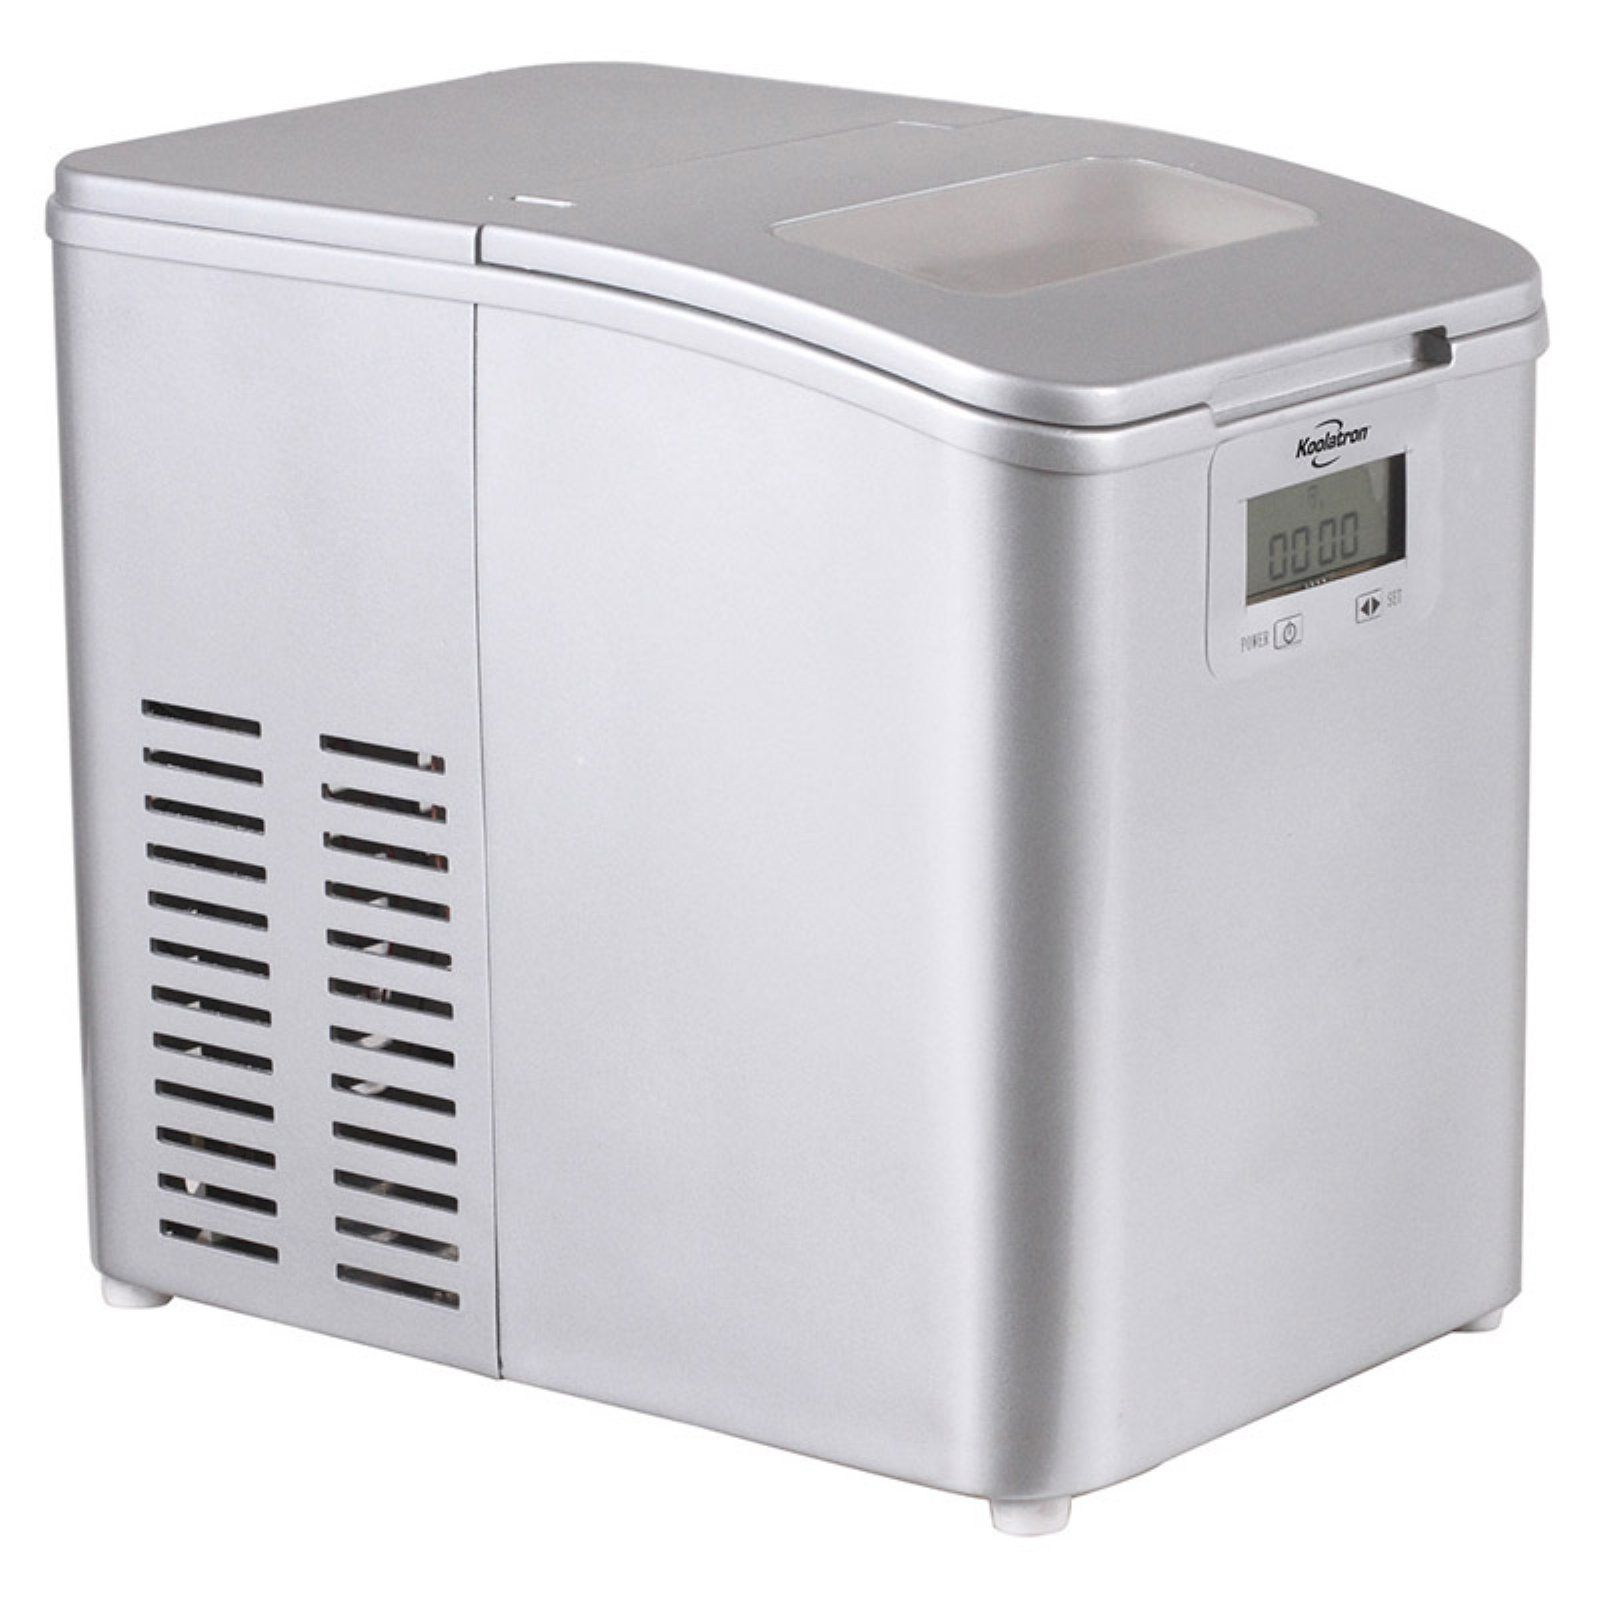 Koolatron Ice Maker Ice maker, Portable ice maker